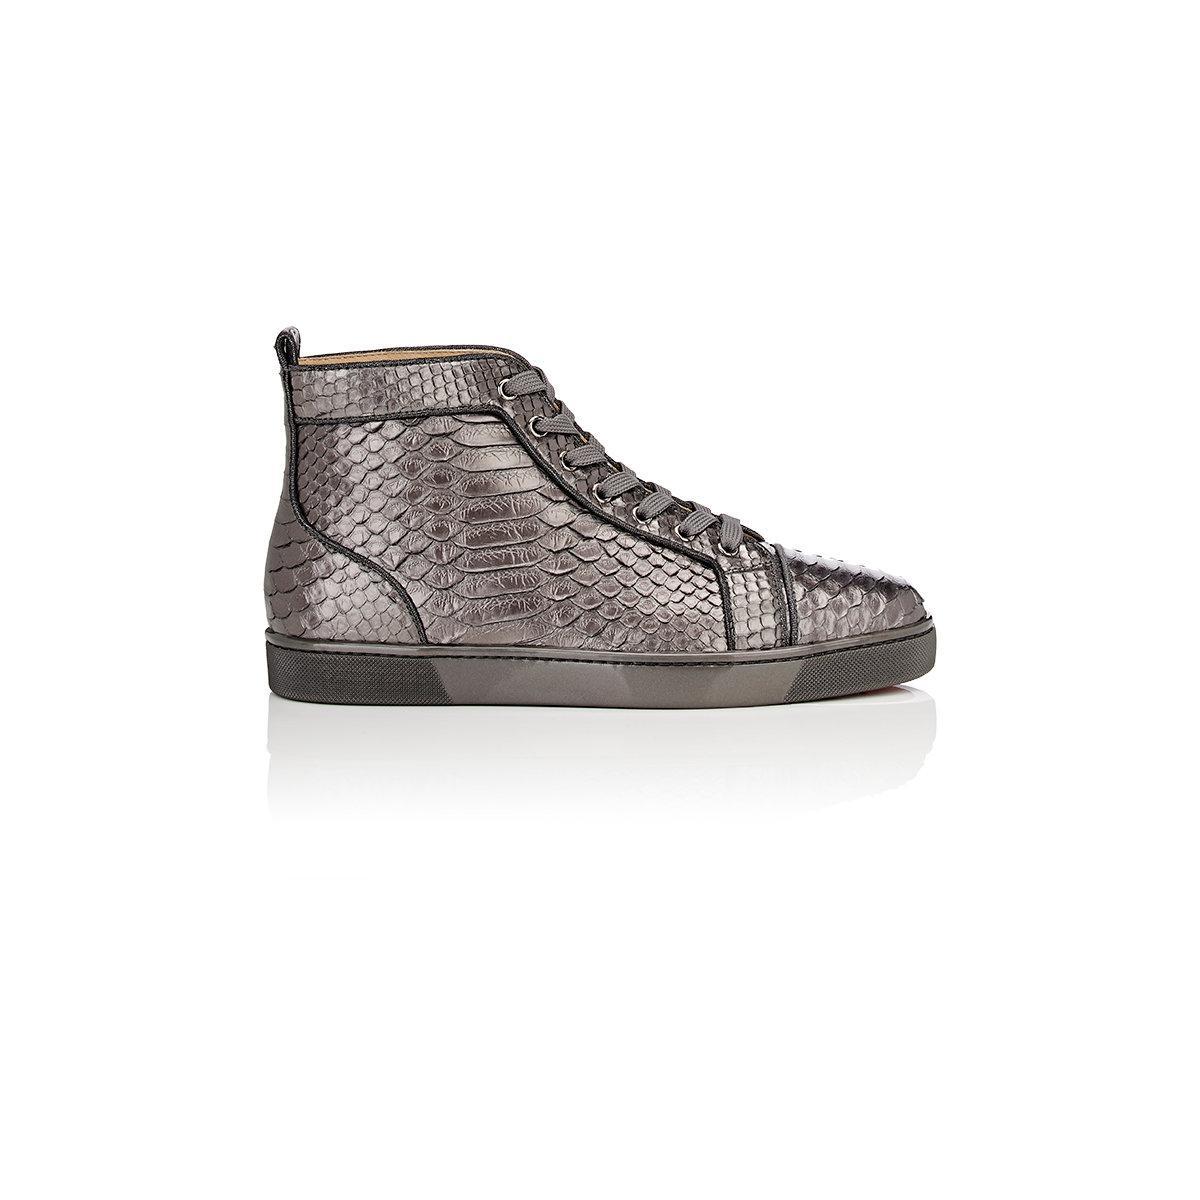 e42a91bbc3fd Christian Louboutin Louis Orlato Flat Python Sneakers in Metallic - Lyst